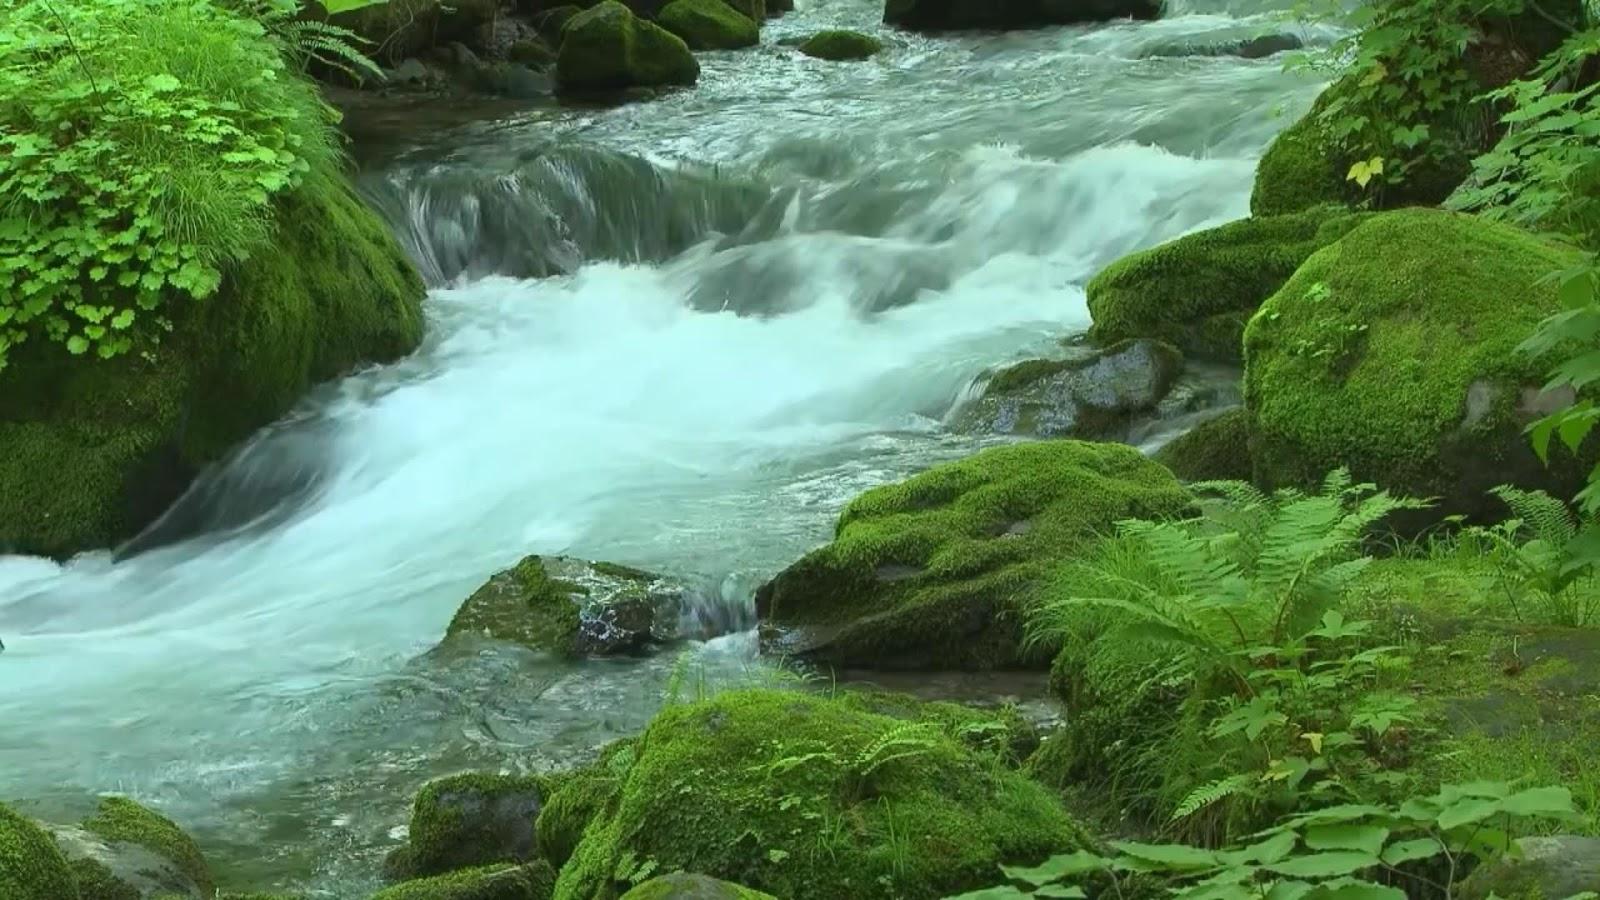 Flowing water casino 16